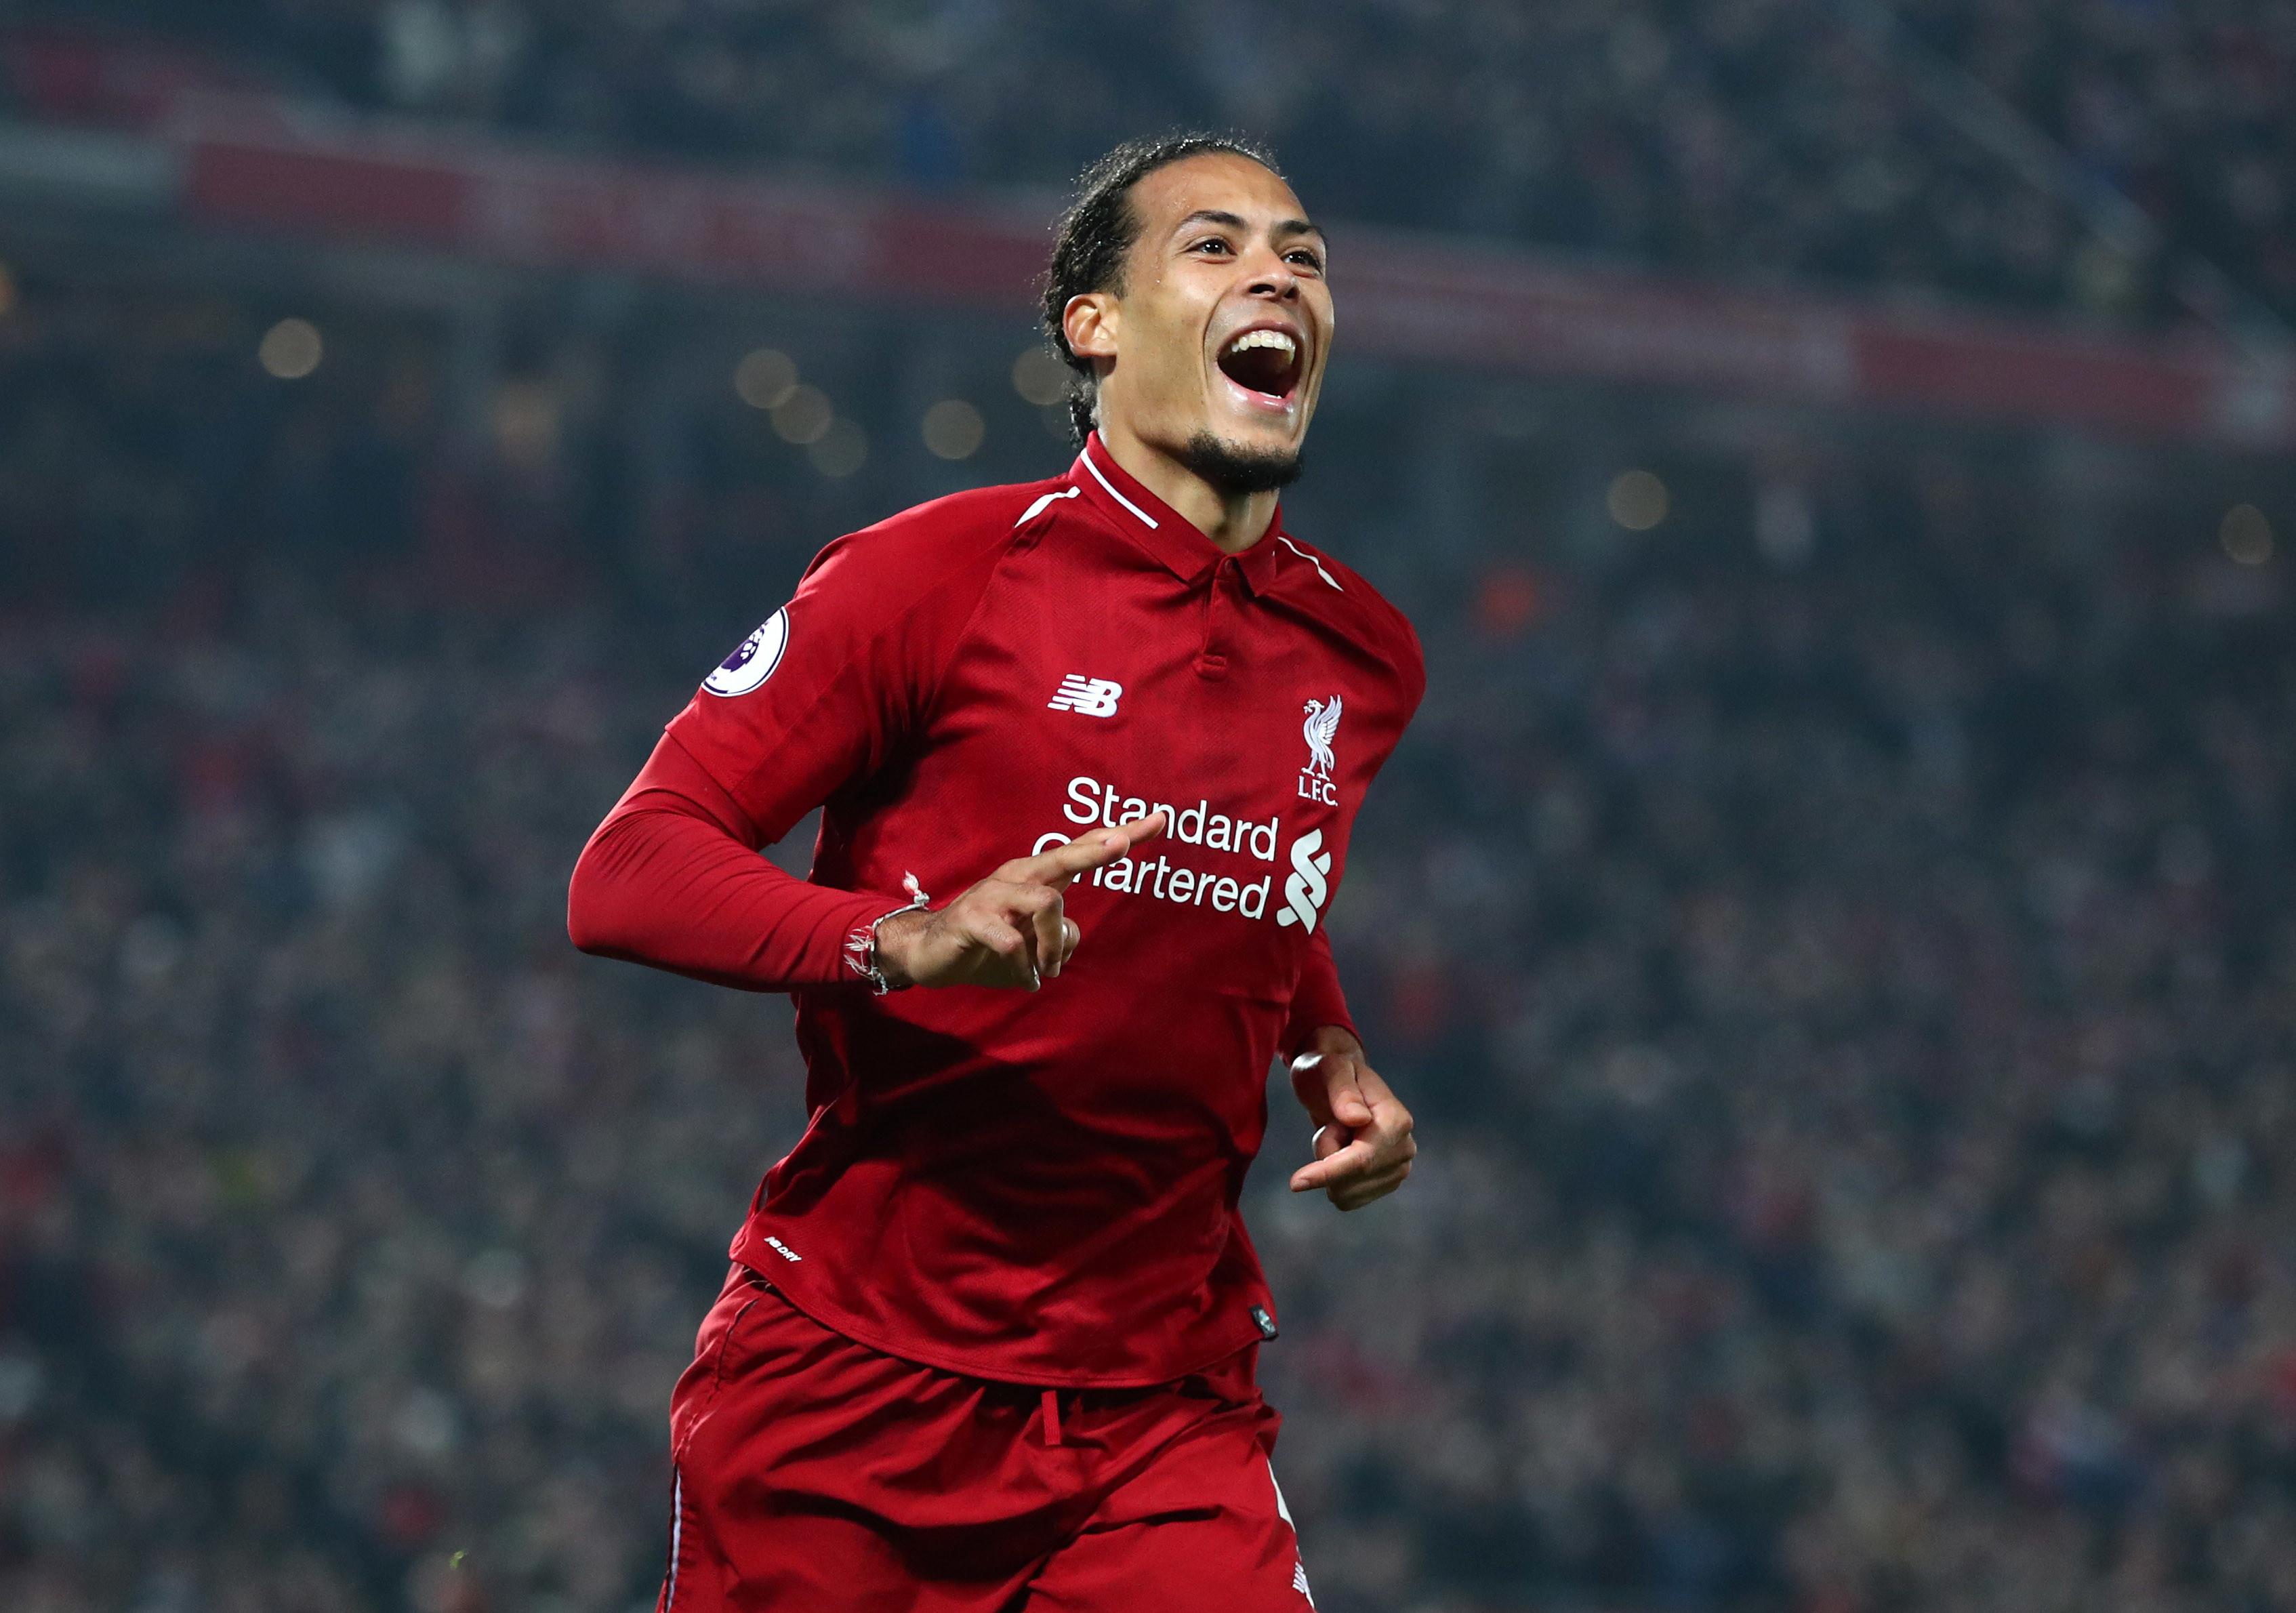 Miglior giocatore dell'anno: Virgil Van Dijk (Liverpool)